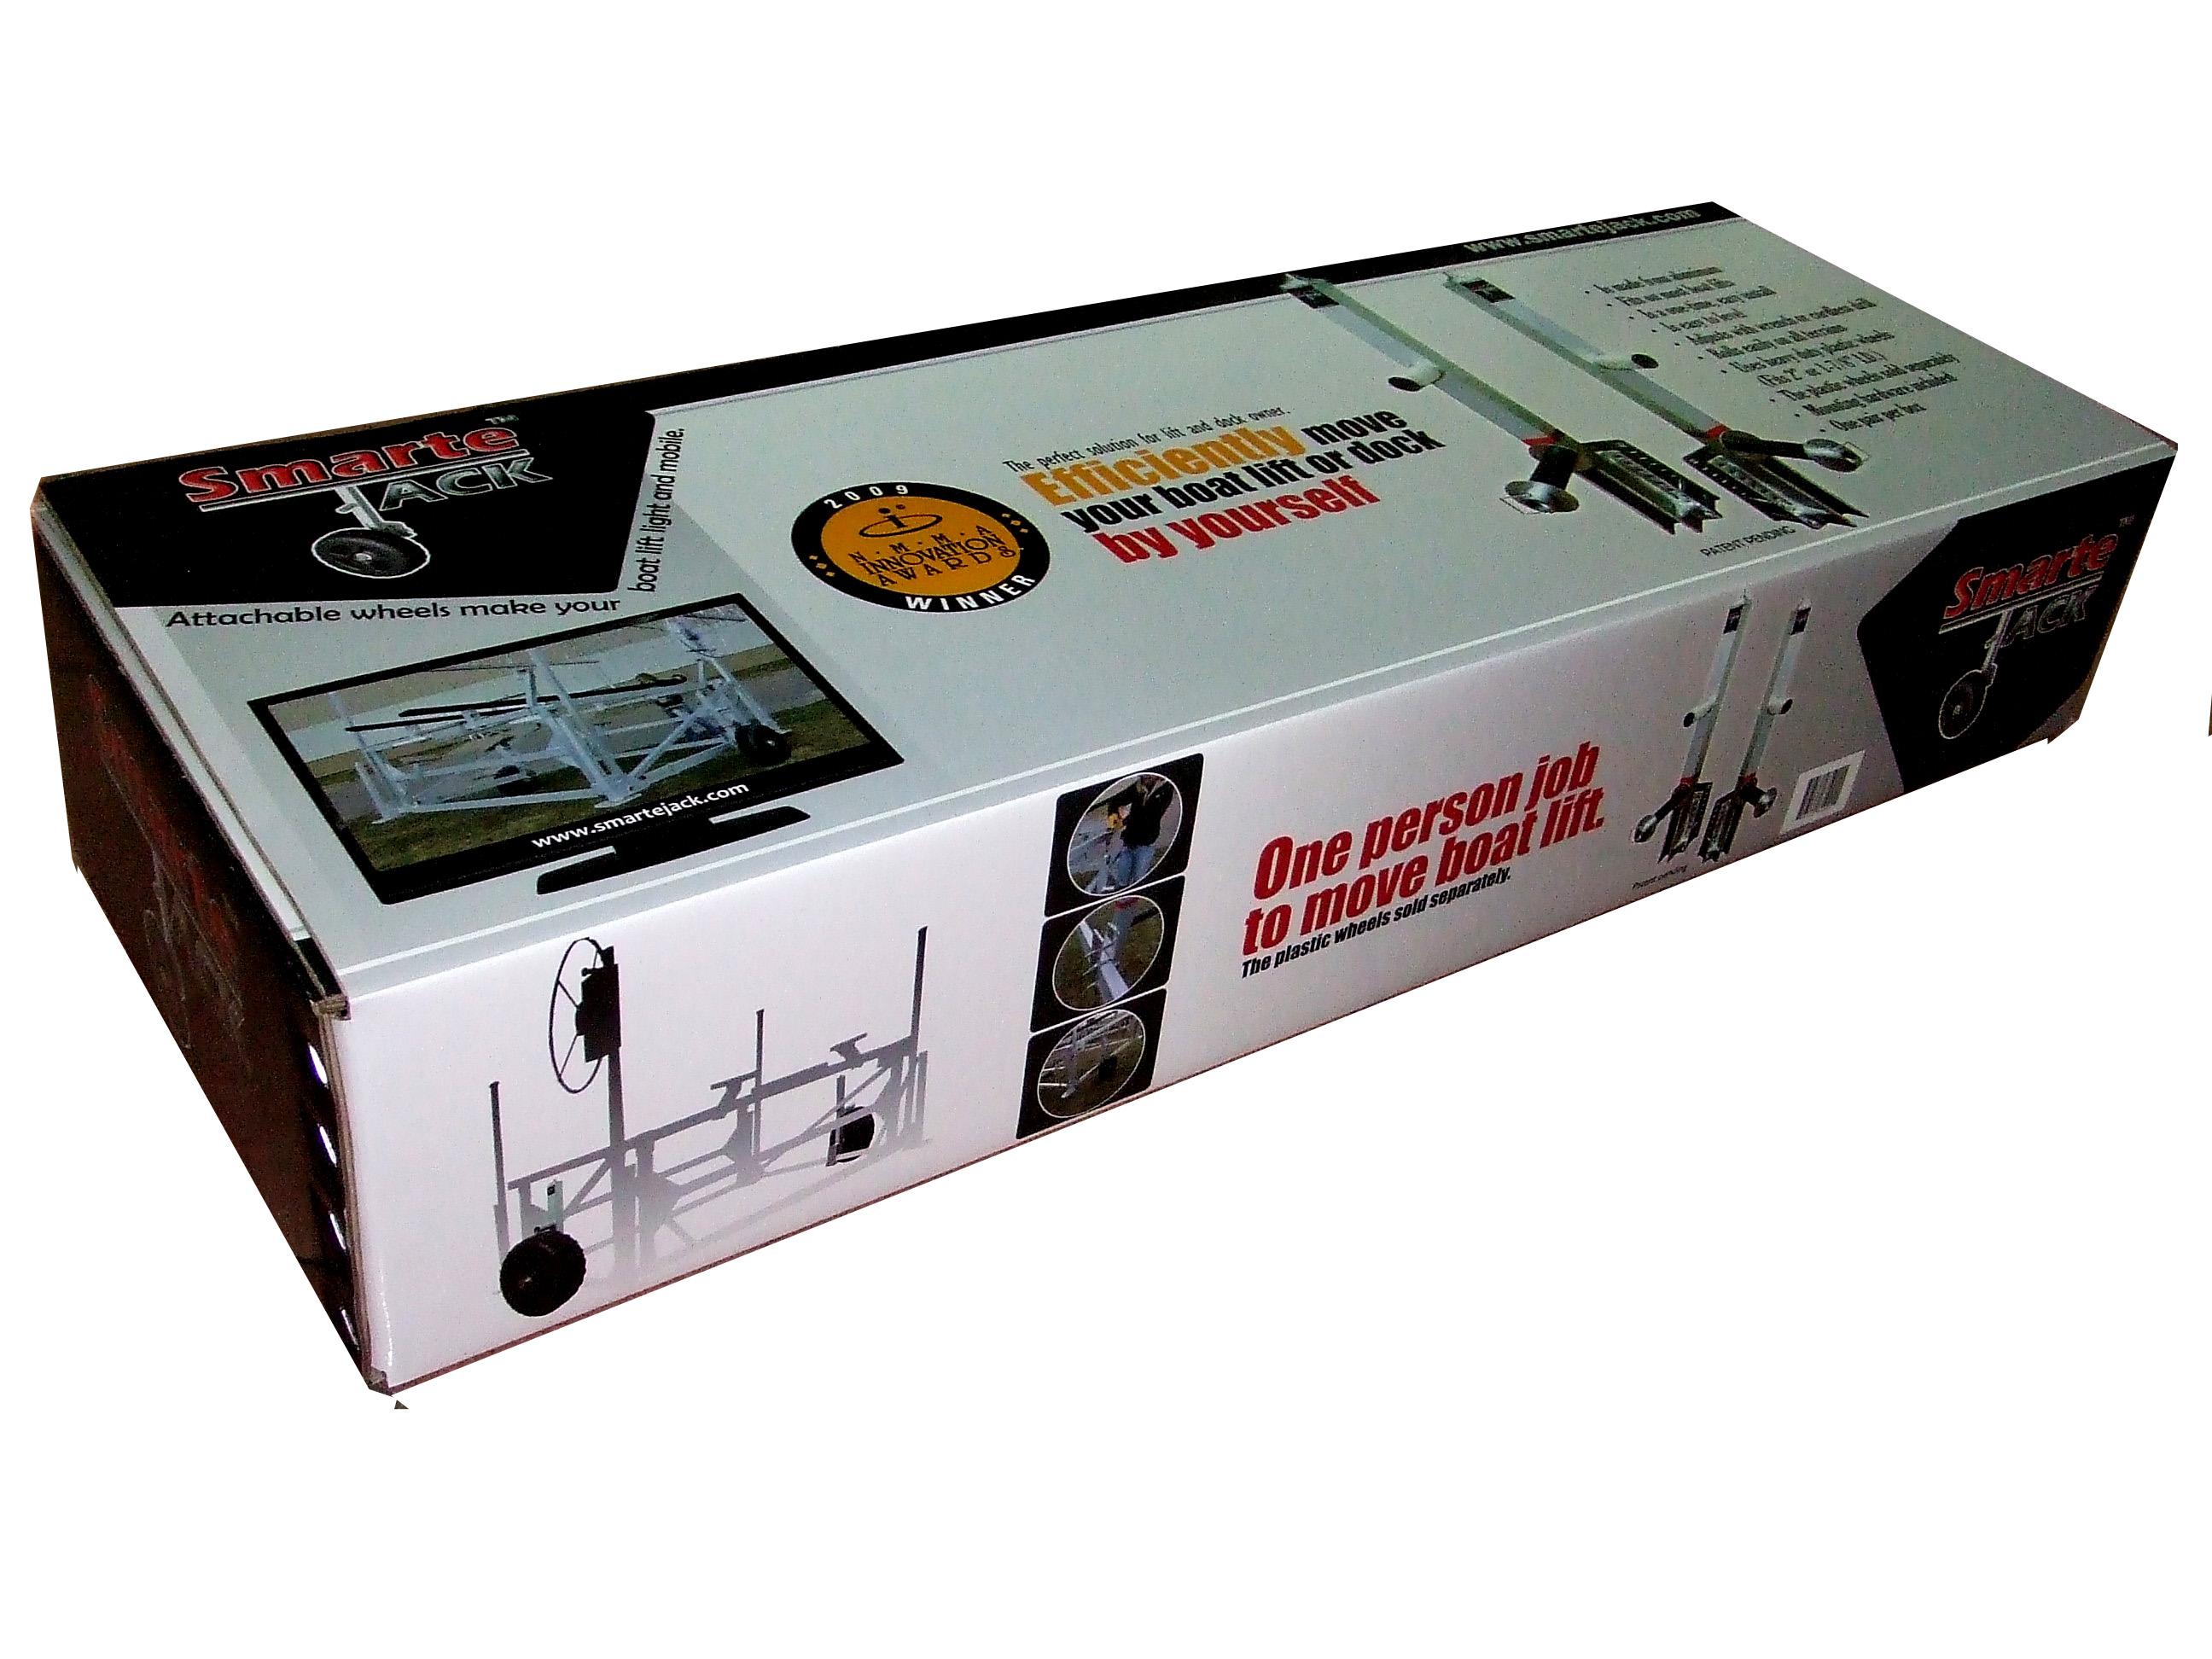 New Smarte Jack box_38.2x14.4x6.9